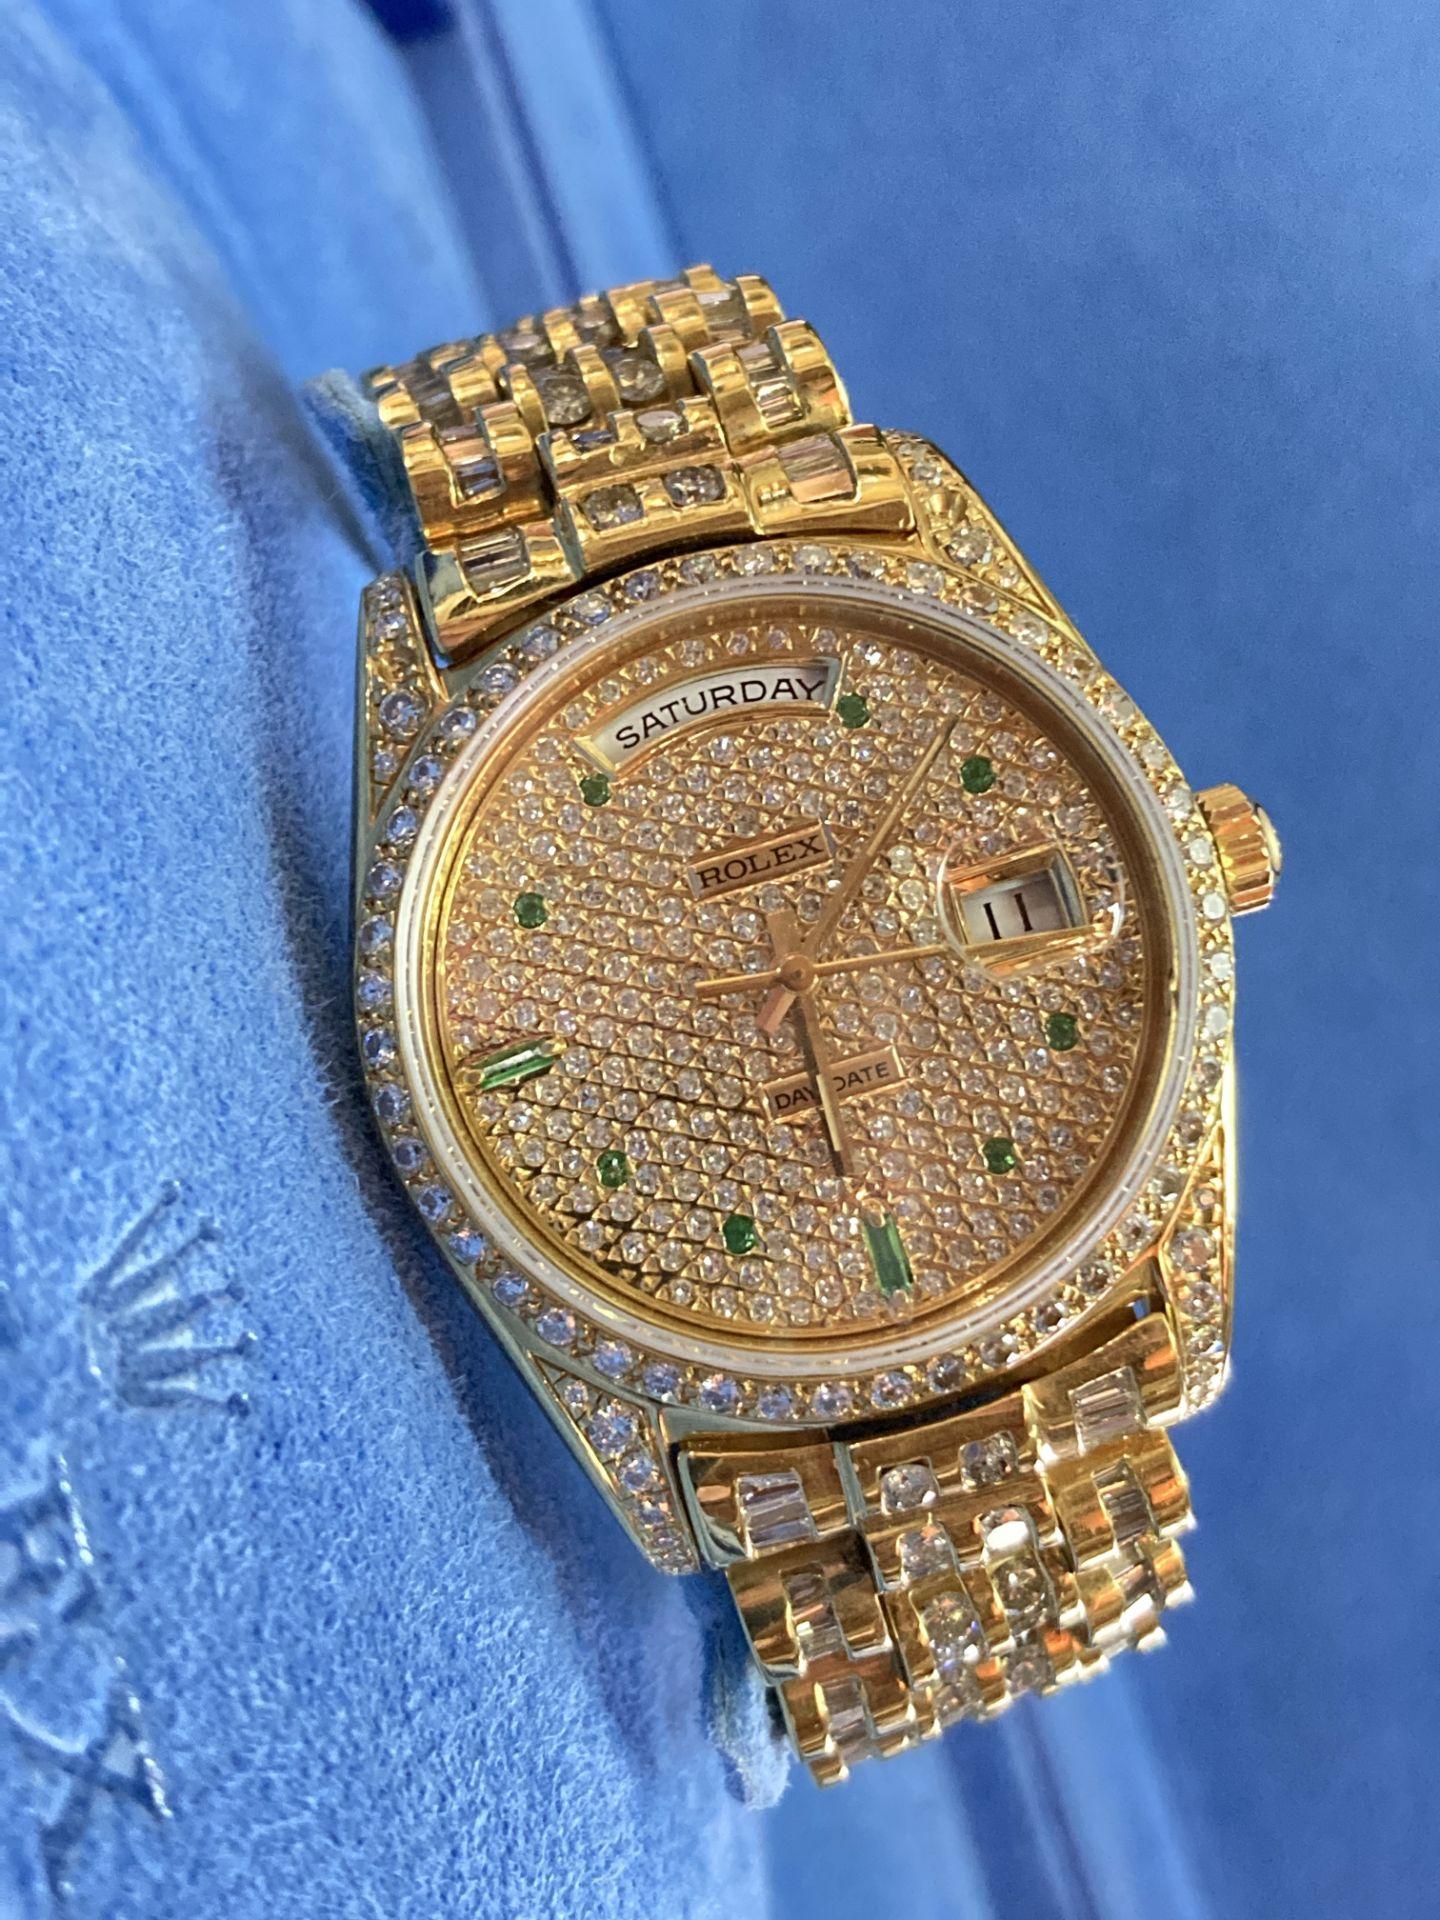 GENTS 36mm ROLEX DAYDATE YELLOW GOLD DIAMOND WATCH - Image 6 of 21